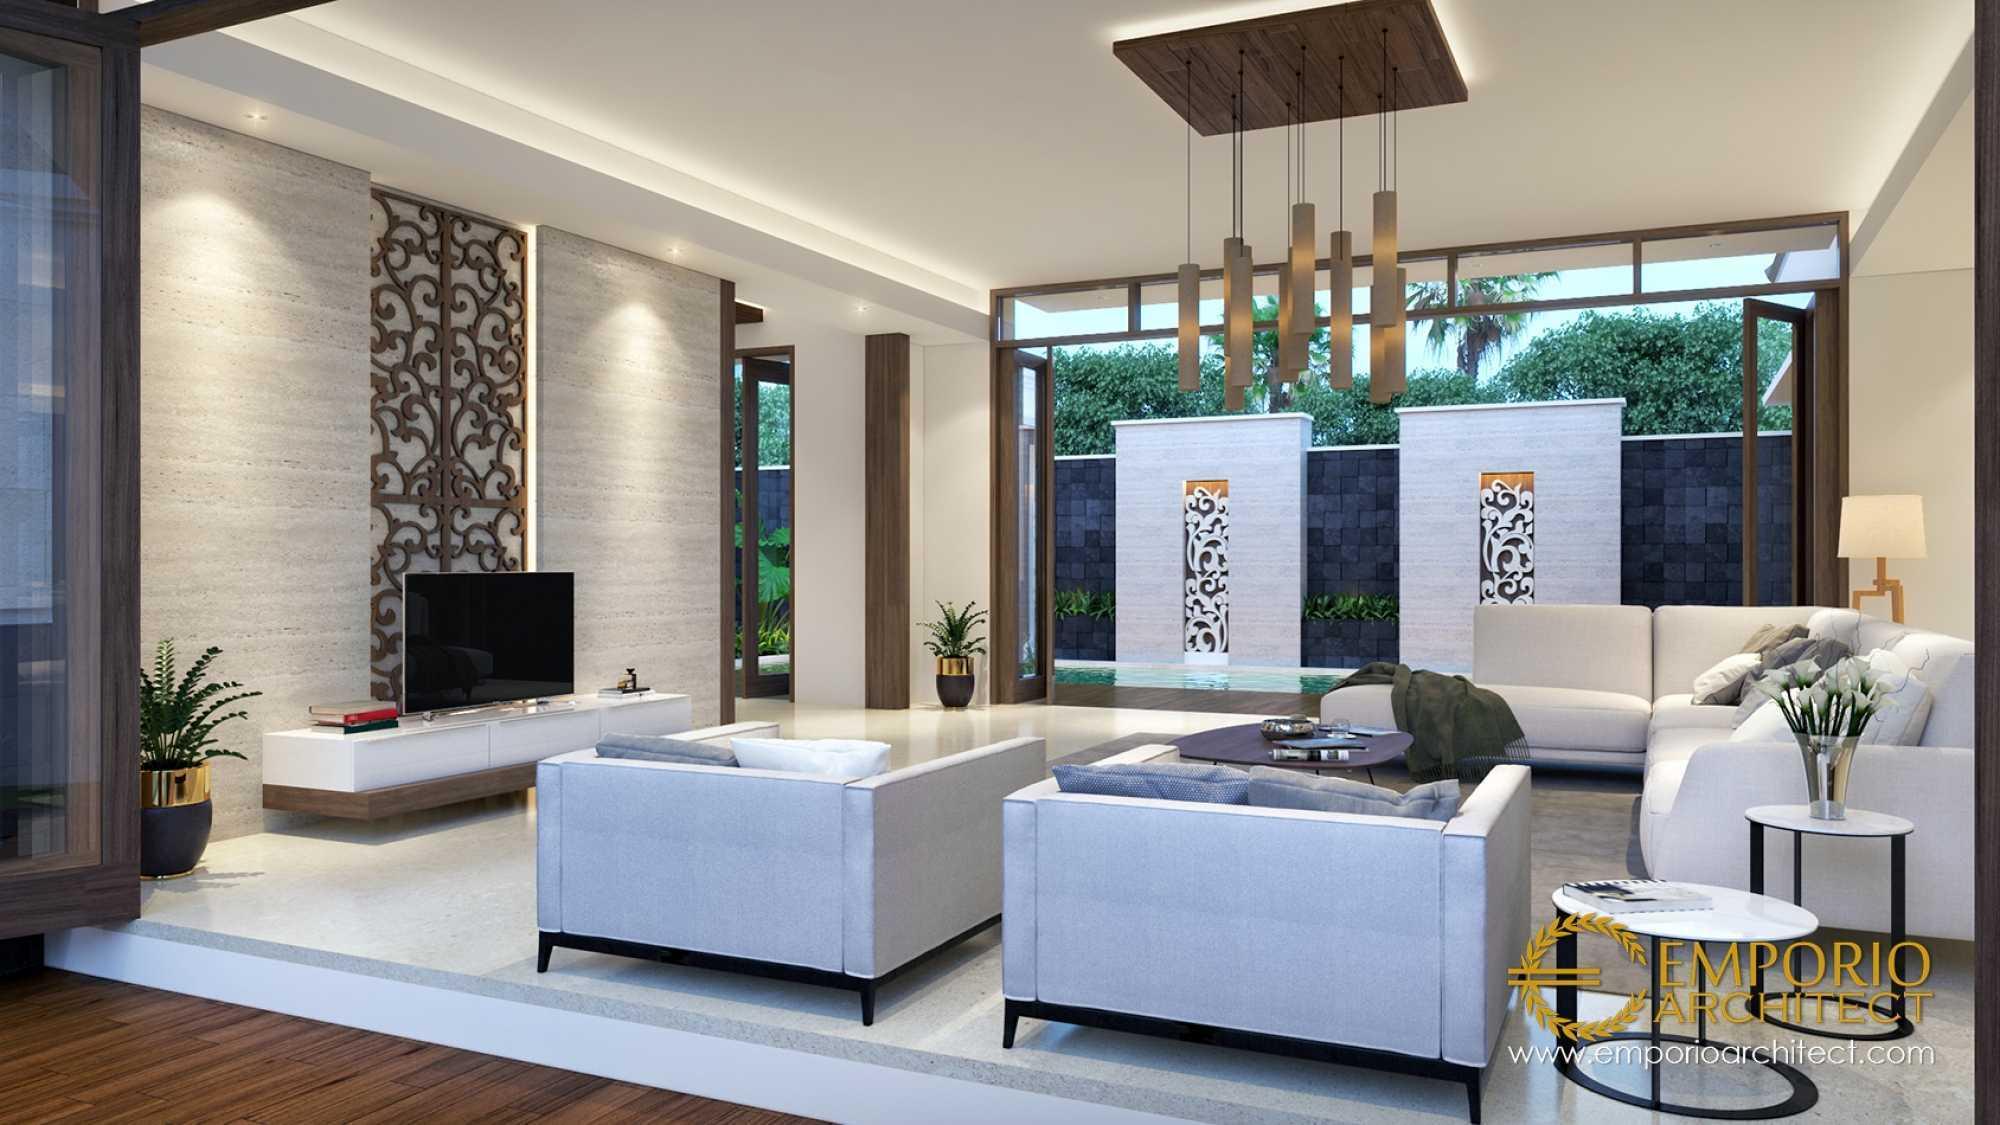 Emporio Architect Desain Rumah Villa Bali Tropis 371 @ Aceh Aceh, Indonesia Aceh, Indonesia Emporio-Architect-Desain-Rumah-Villa-Bali-Tropis-371-Aceh  76156